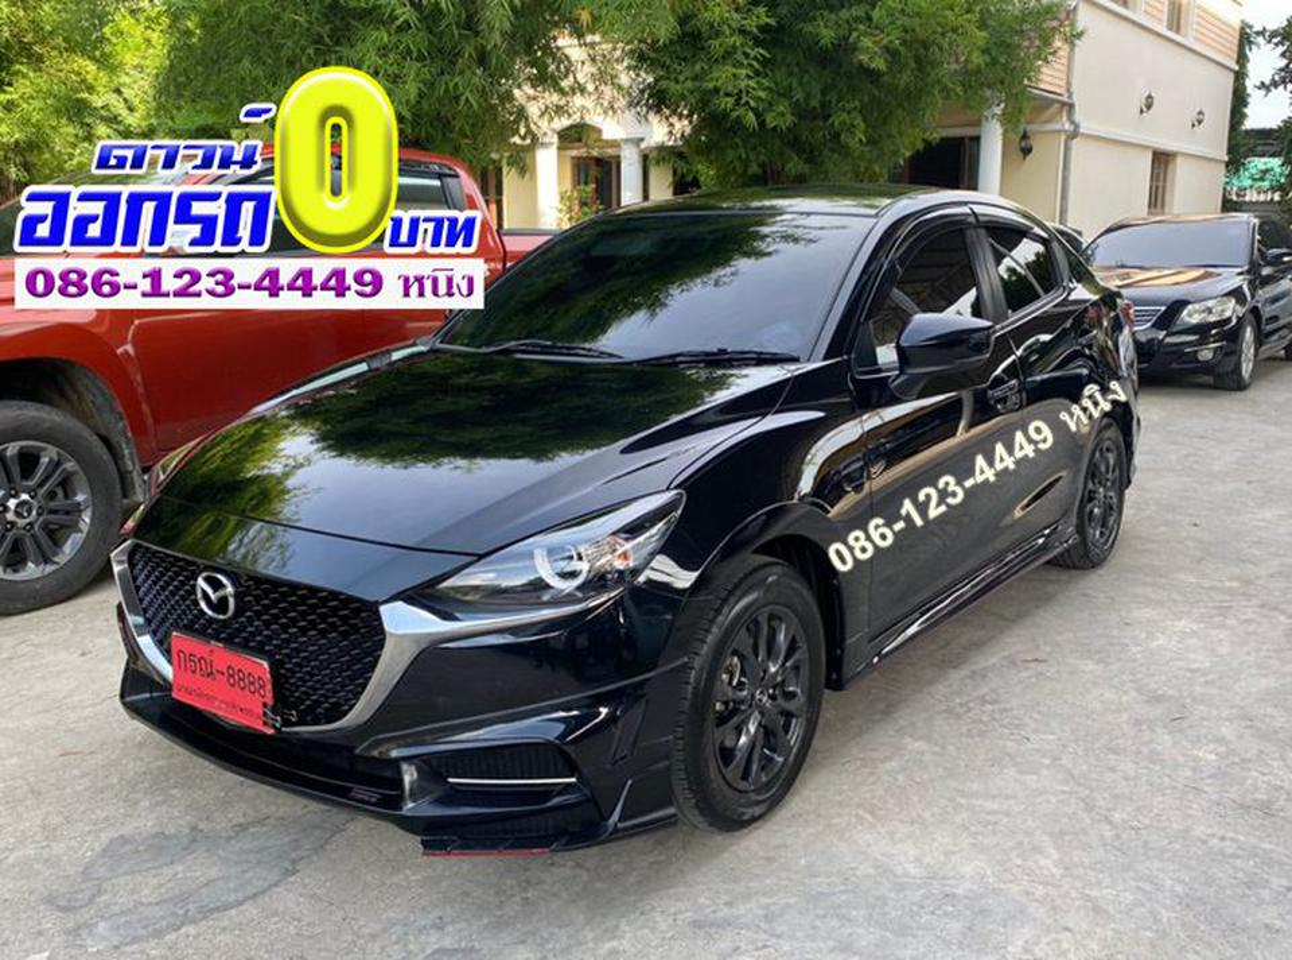 Mazda 2 1.3 S Sedan ปี 2020แท้ รูปที่ 1